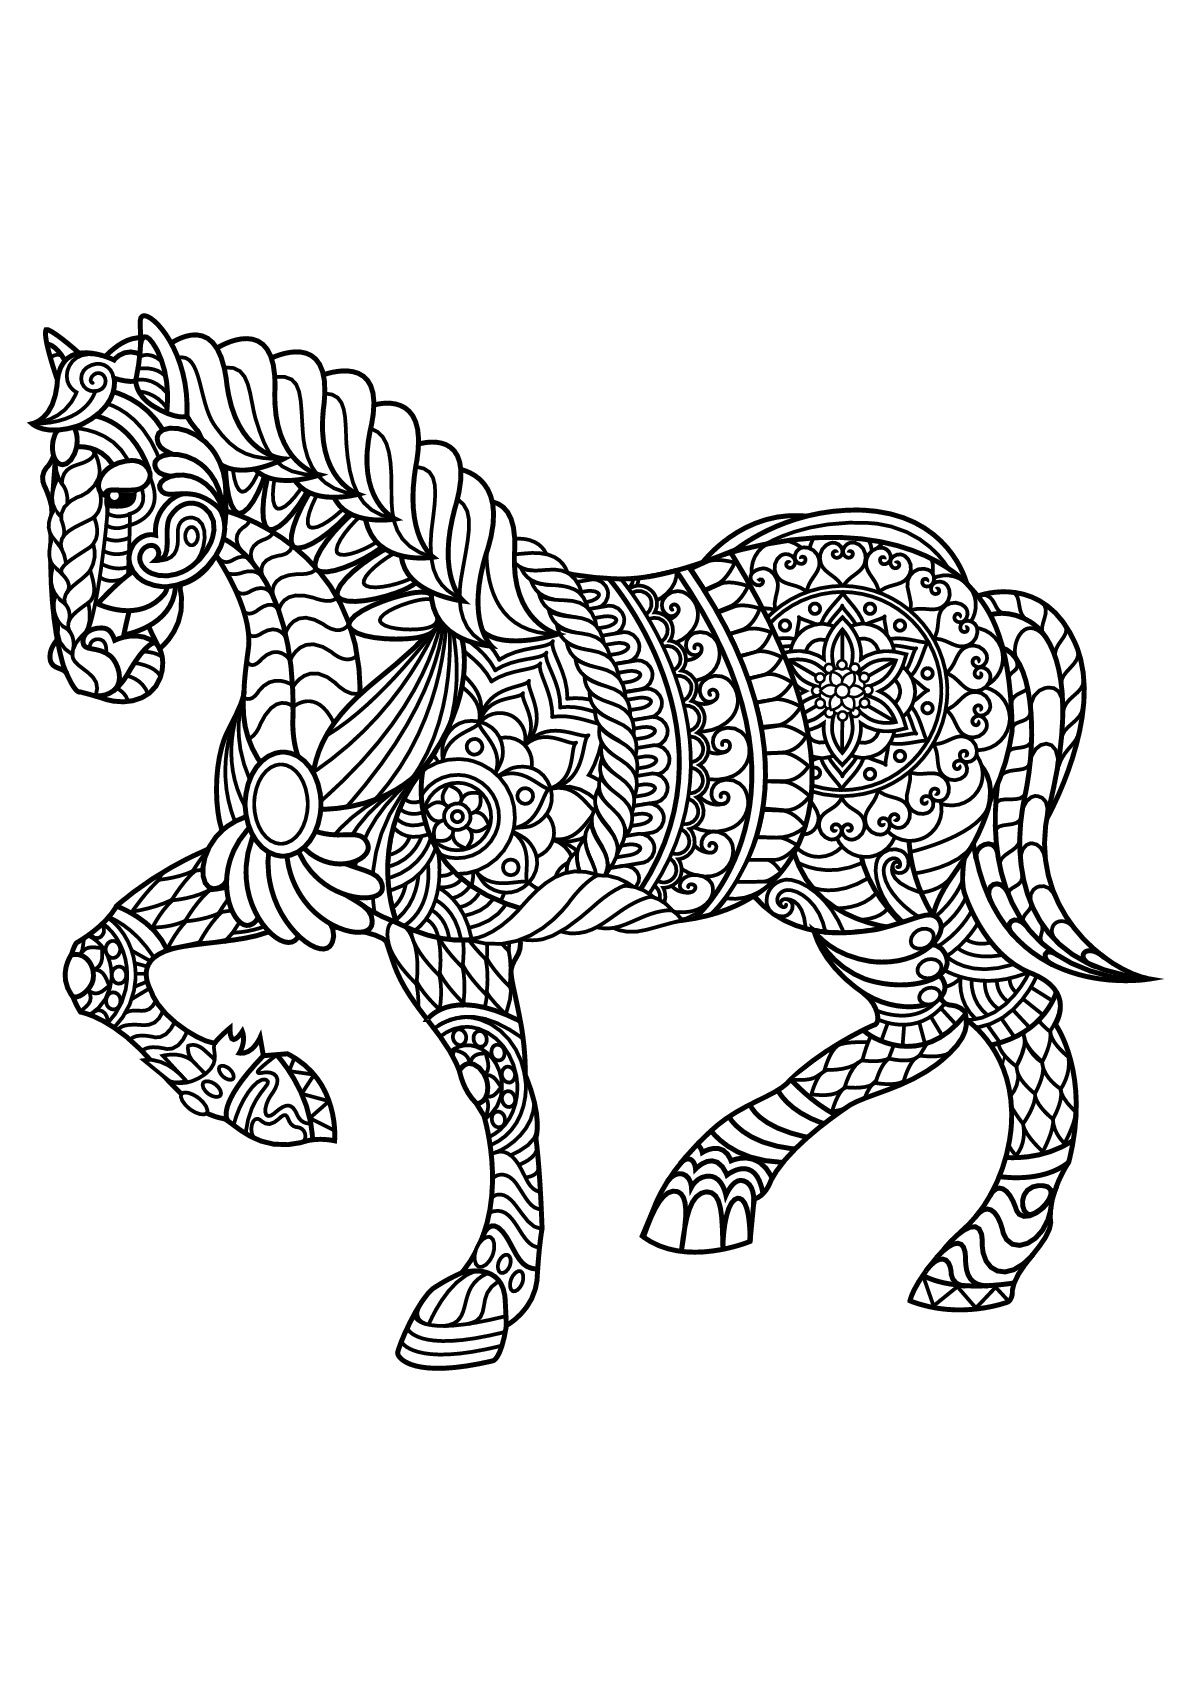 Free Book Horse Horses Coloring Pages For Adults Justcolor Mandalas De Caballos Mandalas Para Colorear Animales Mandalas Para Colorear Ninos